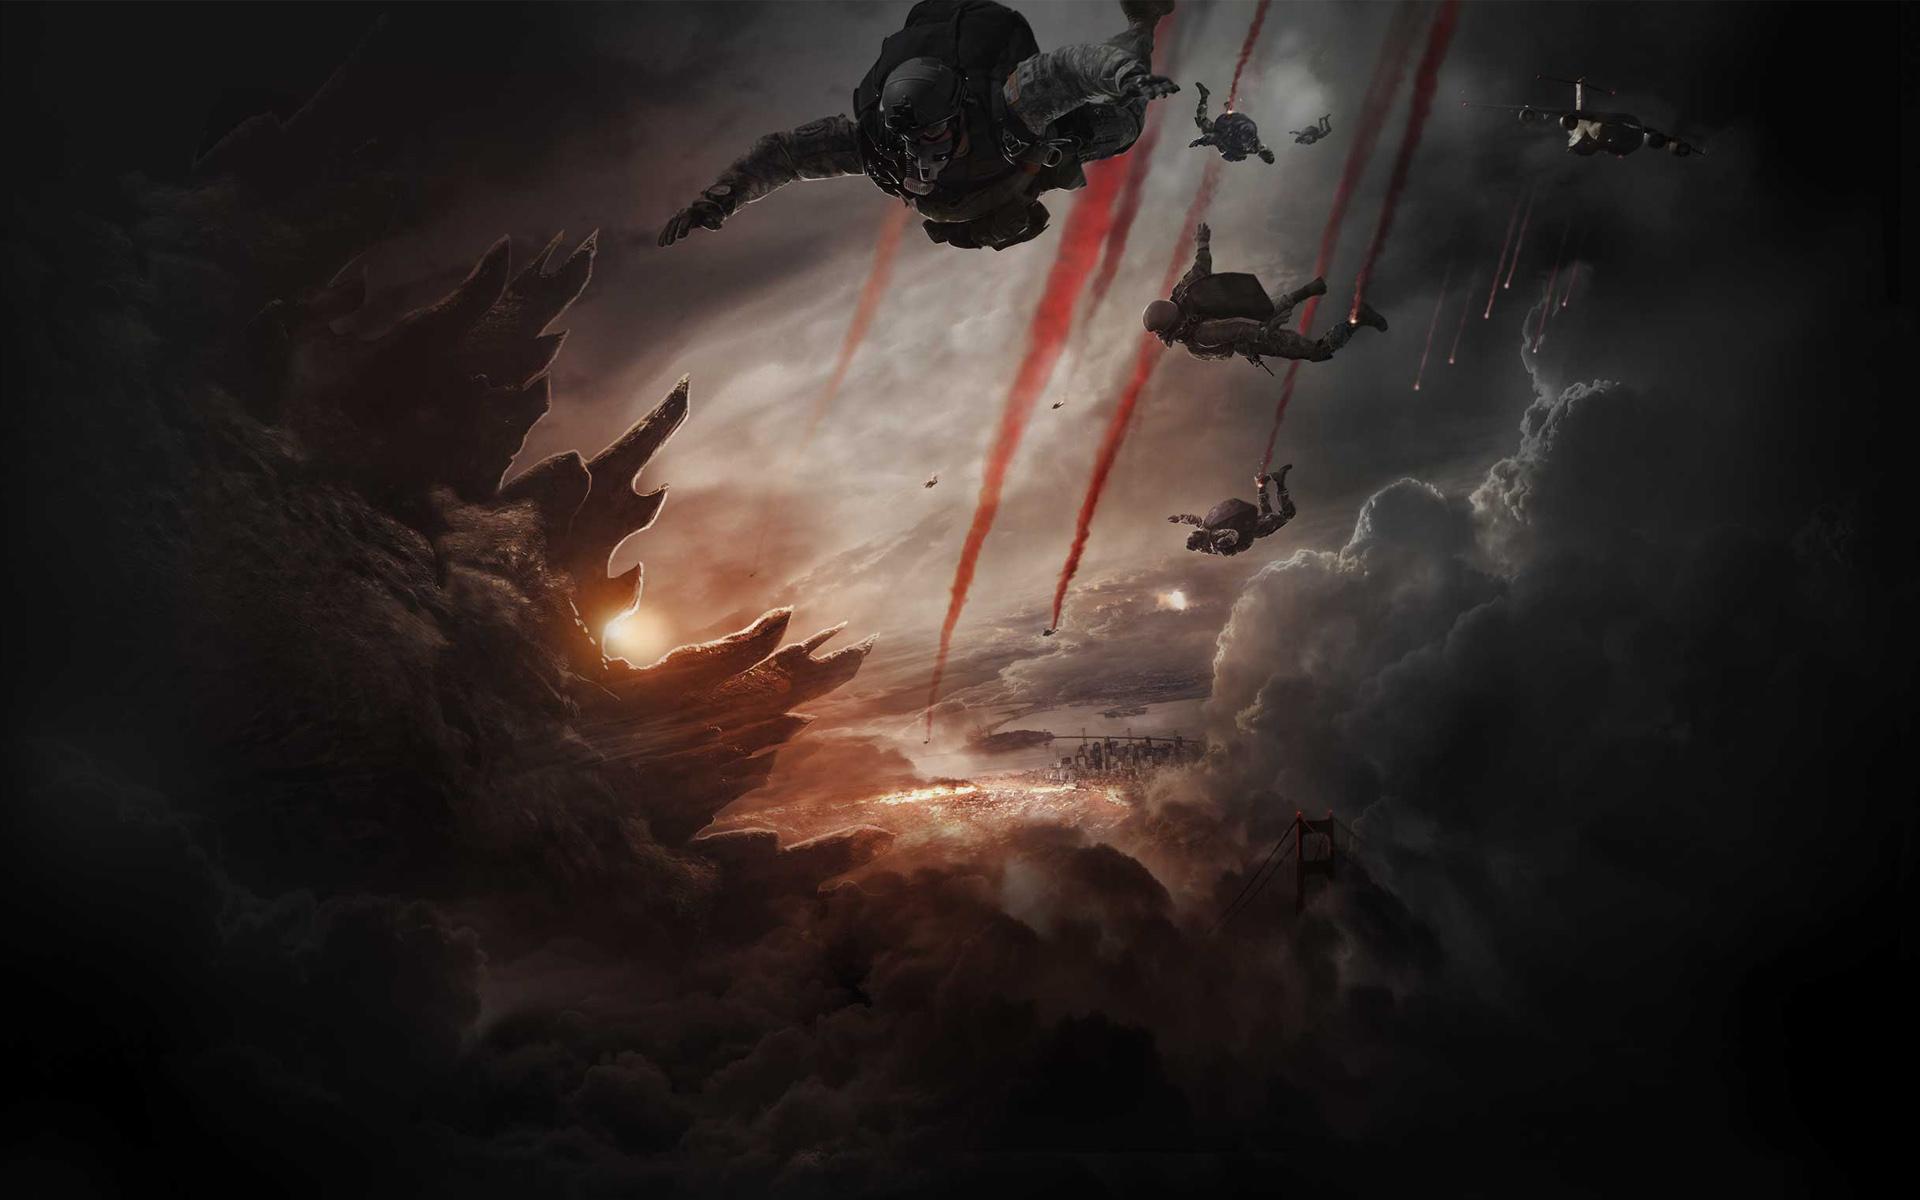 Godzilla 2014 Movie Wallpapers HD Wallpapers 1920x1200